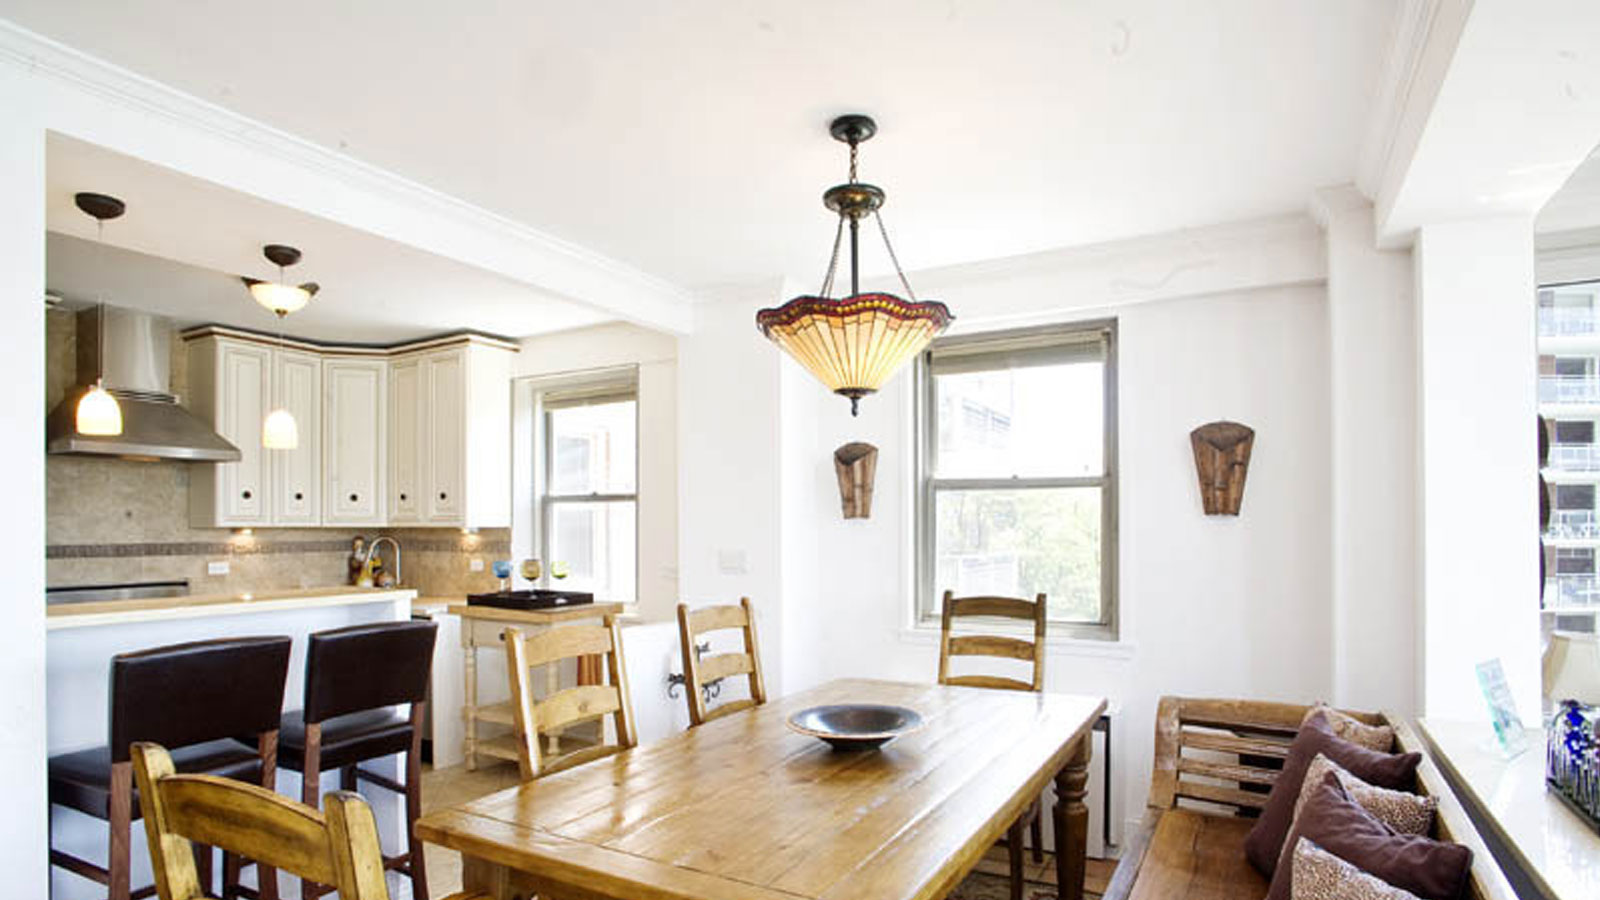 Spuyten Duyvil Apartments For Sale